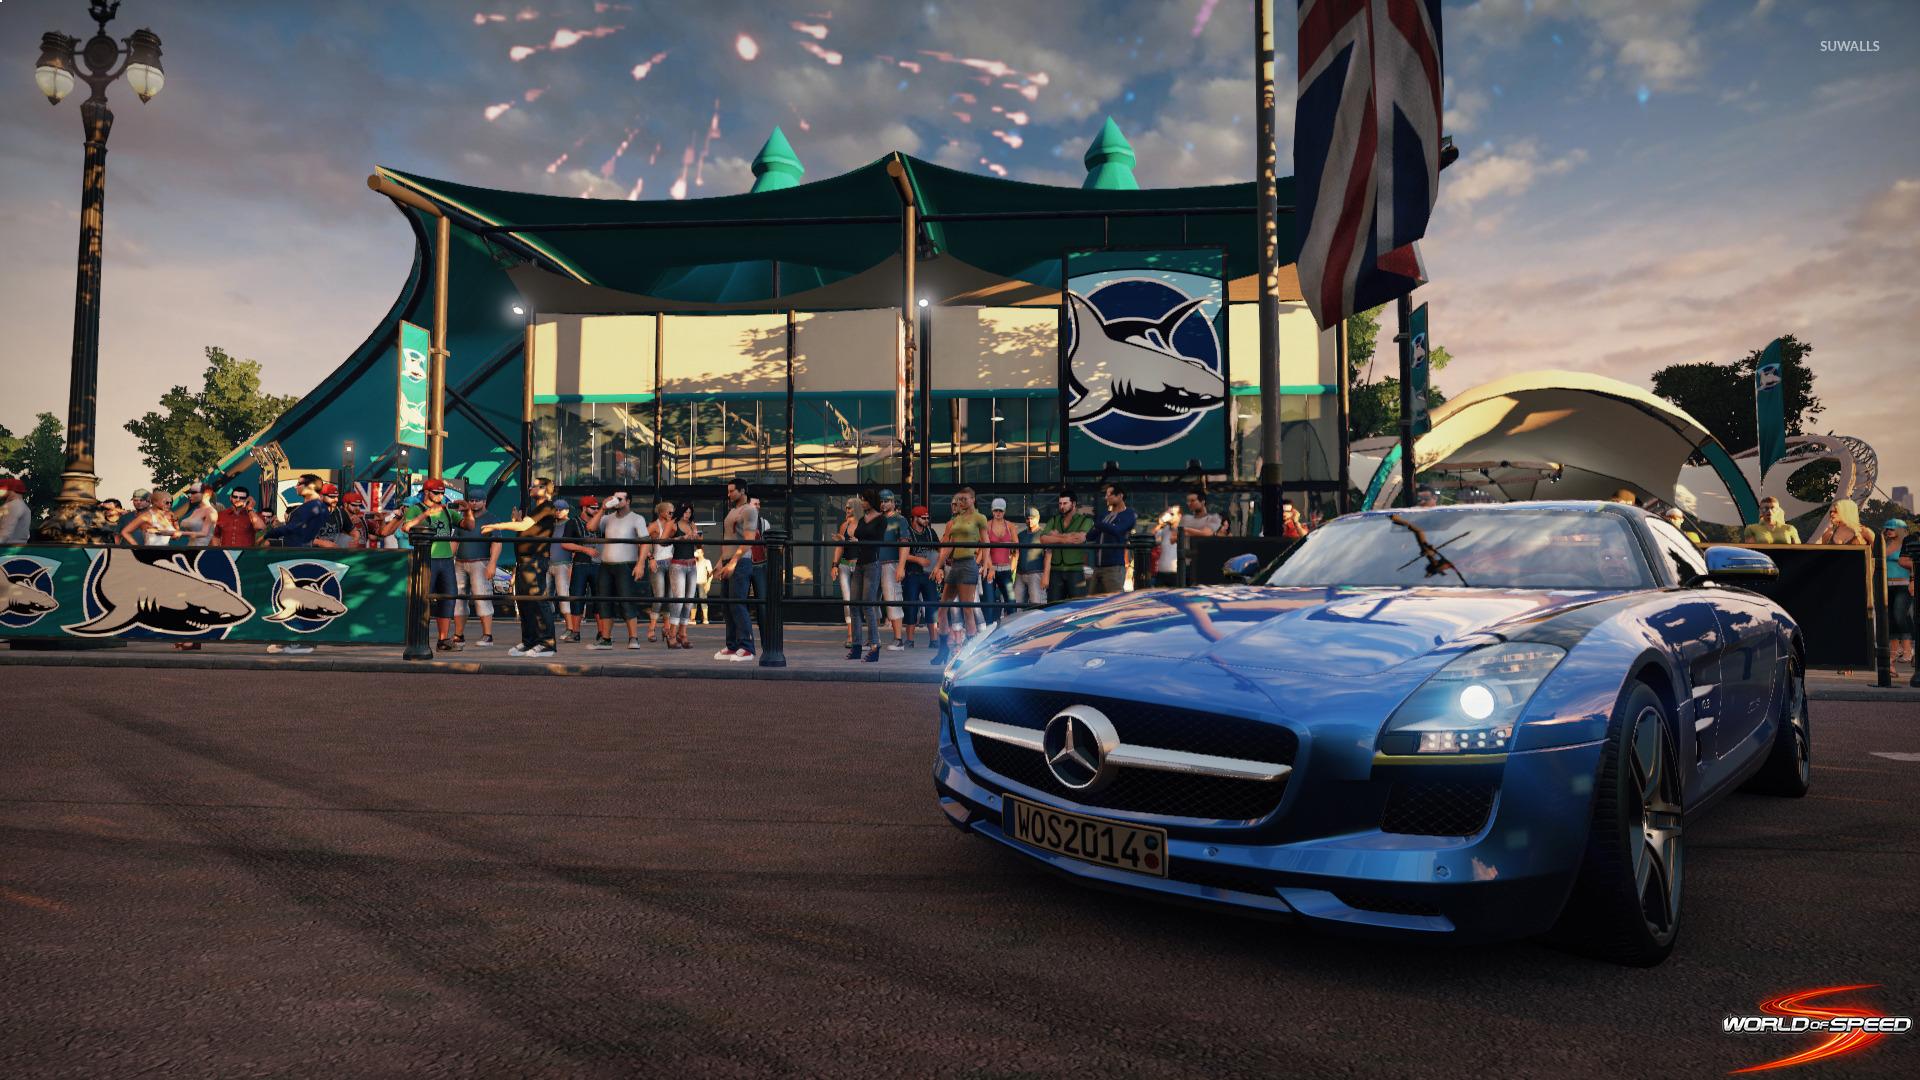 Mercedes benz sls amg world of speed wallpaper game for Mercedes benz games